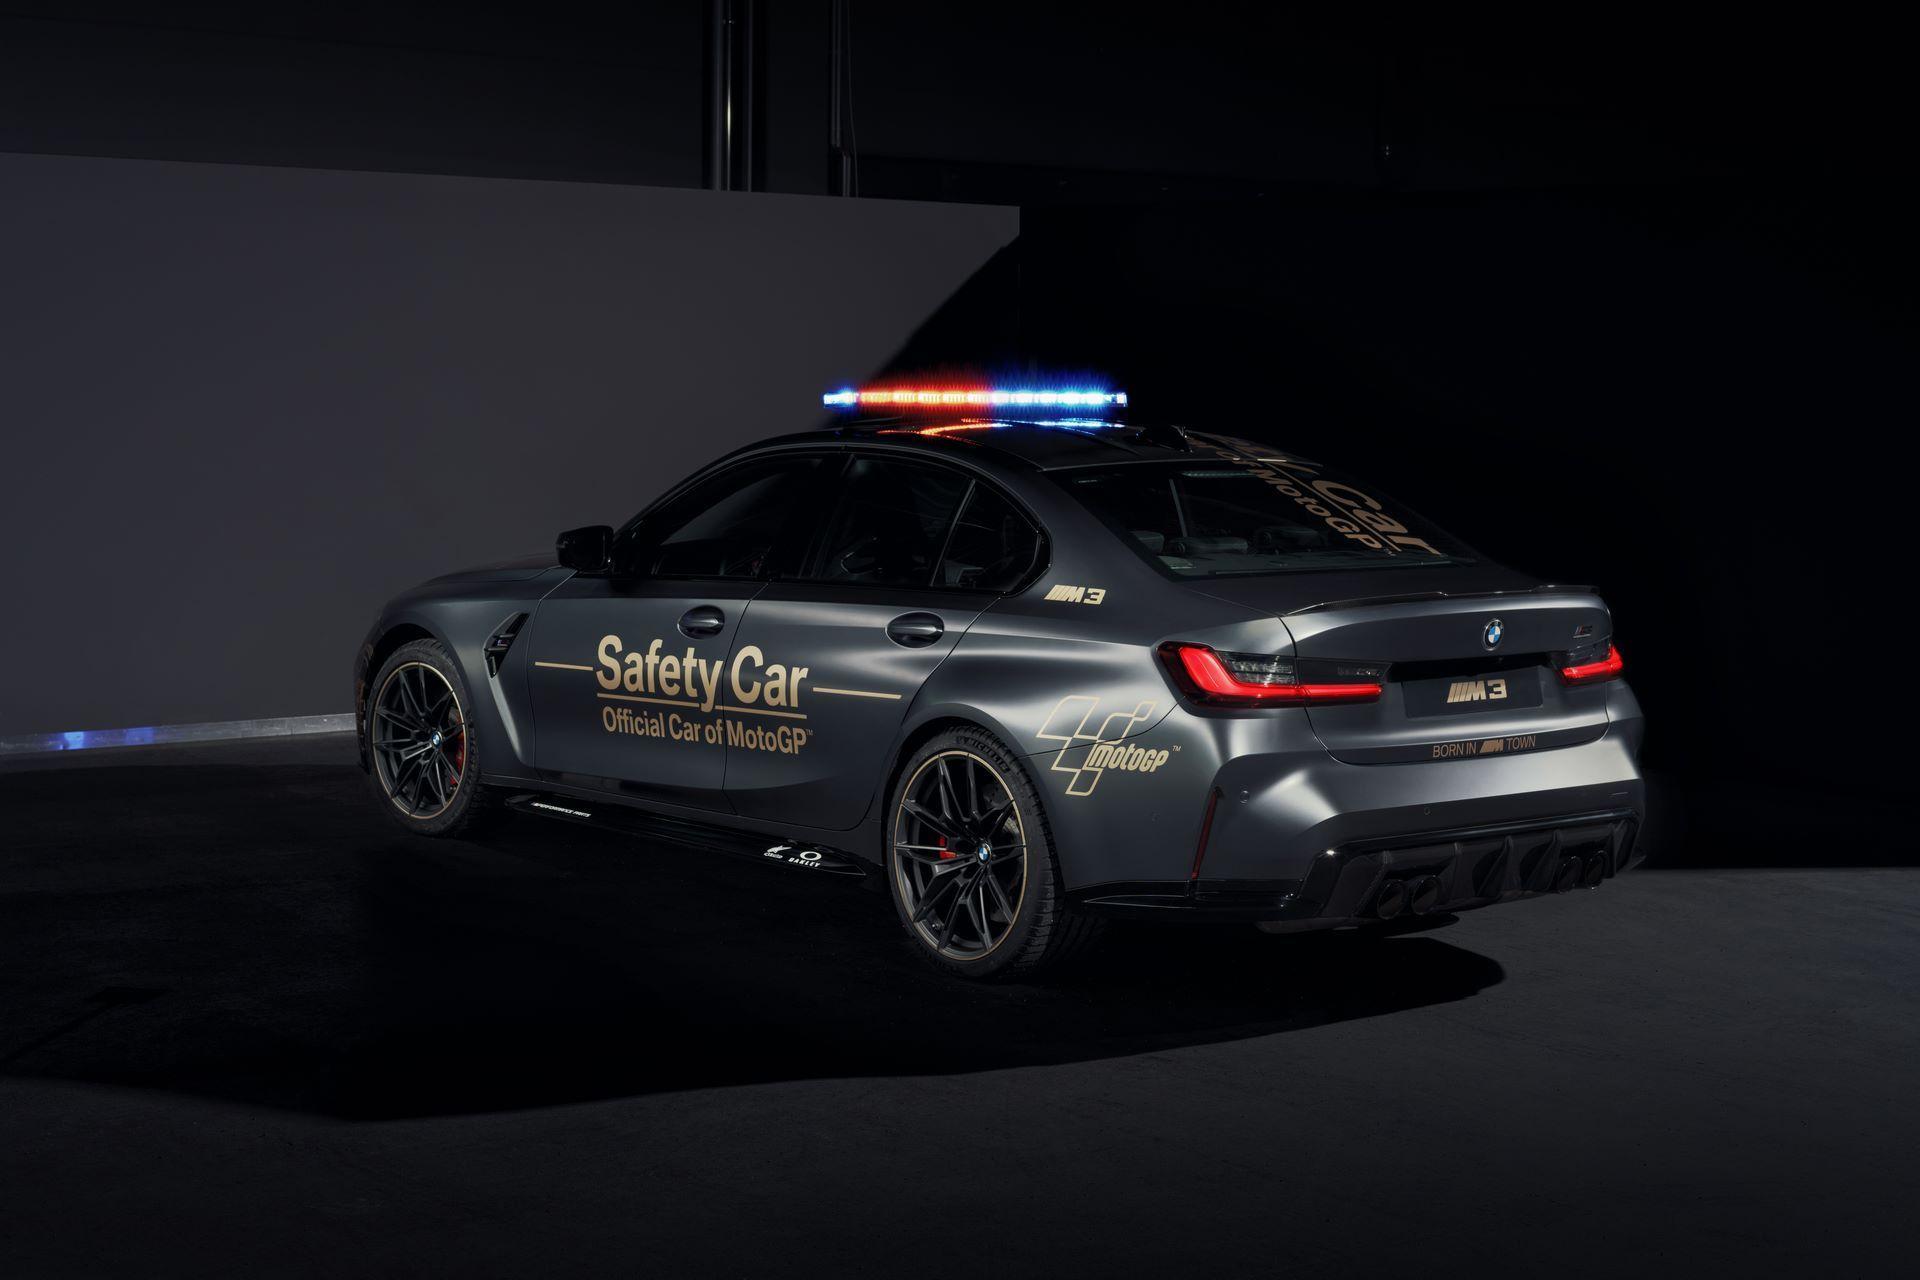 BMW-M3-M4-M5-CS-Safety-Cars-moto-gp-motogp-4